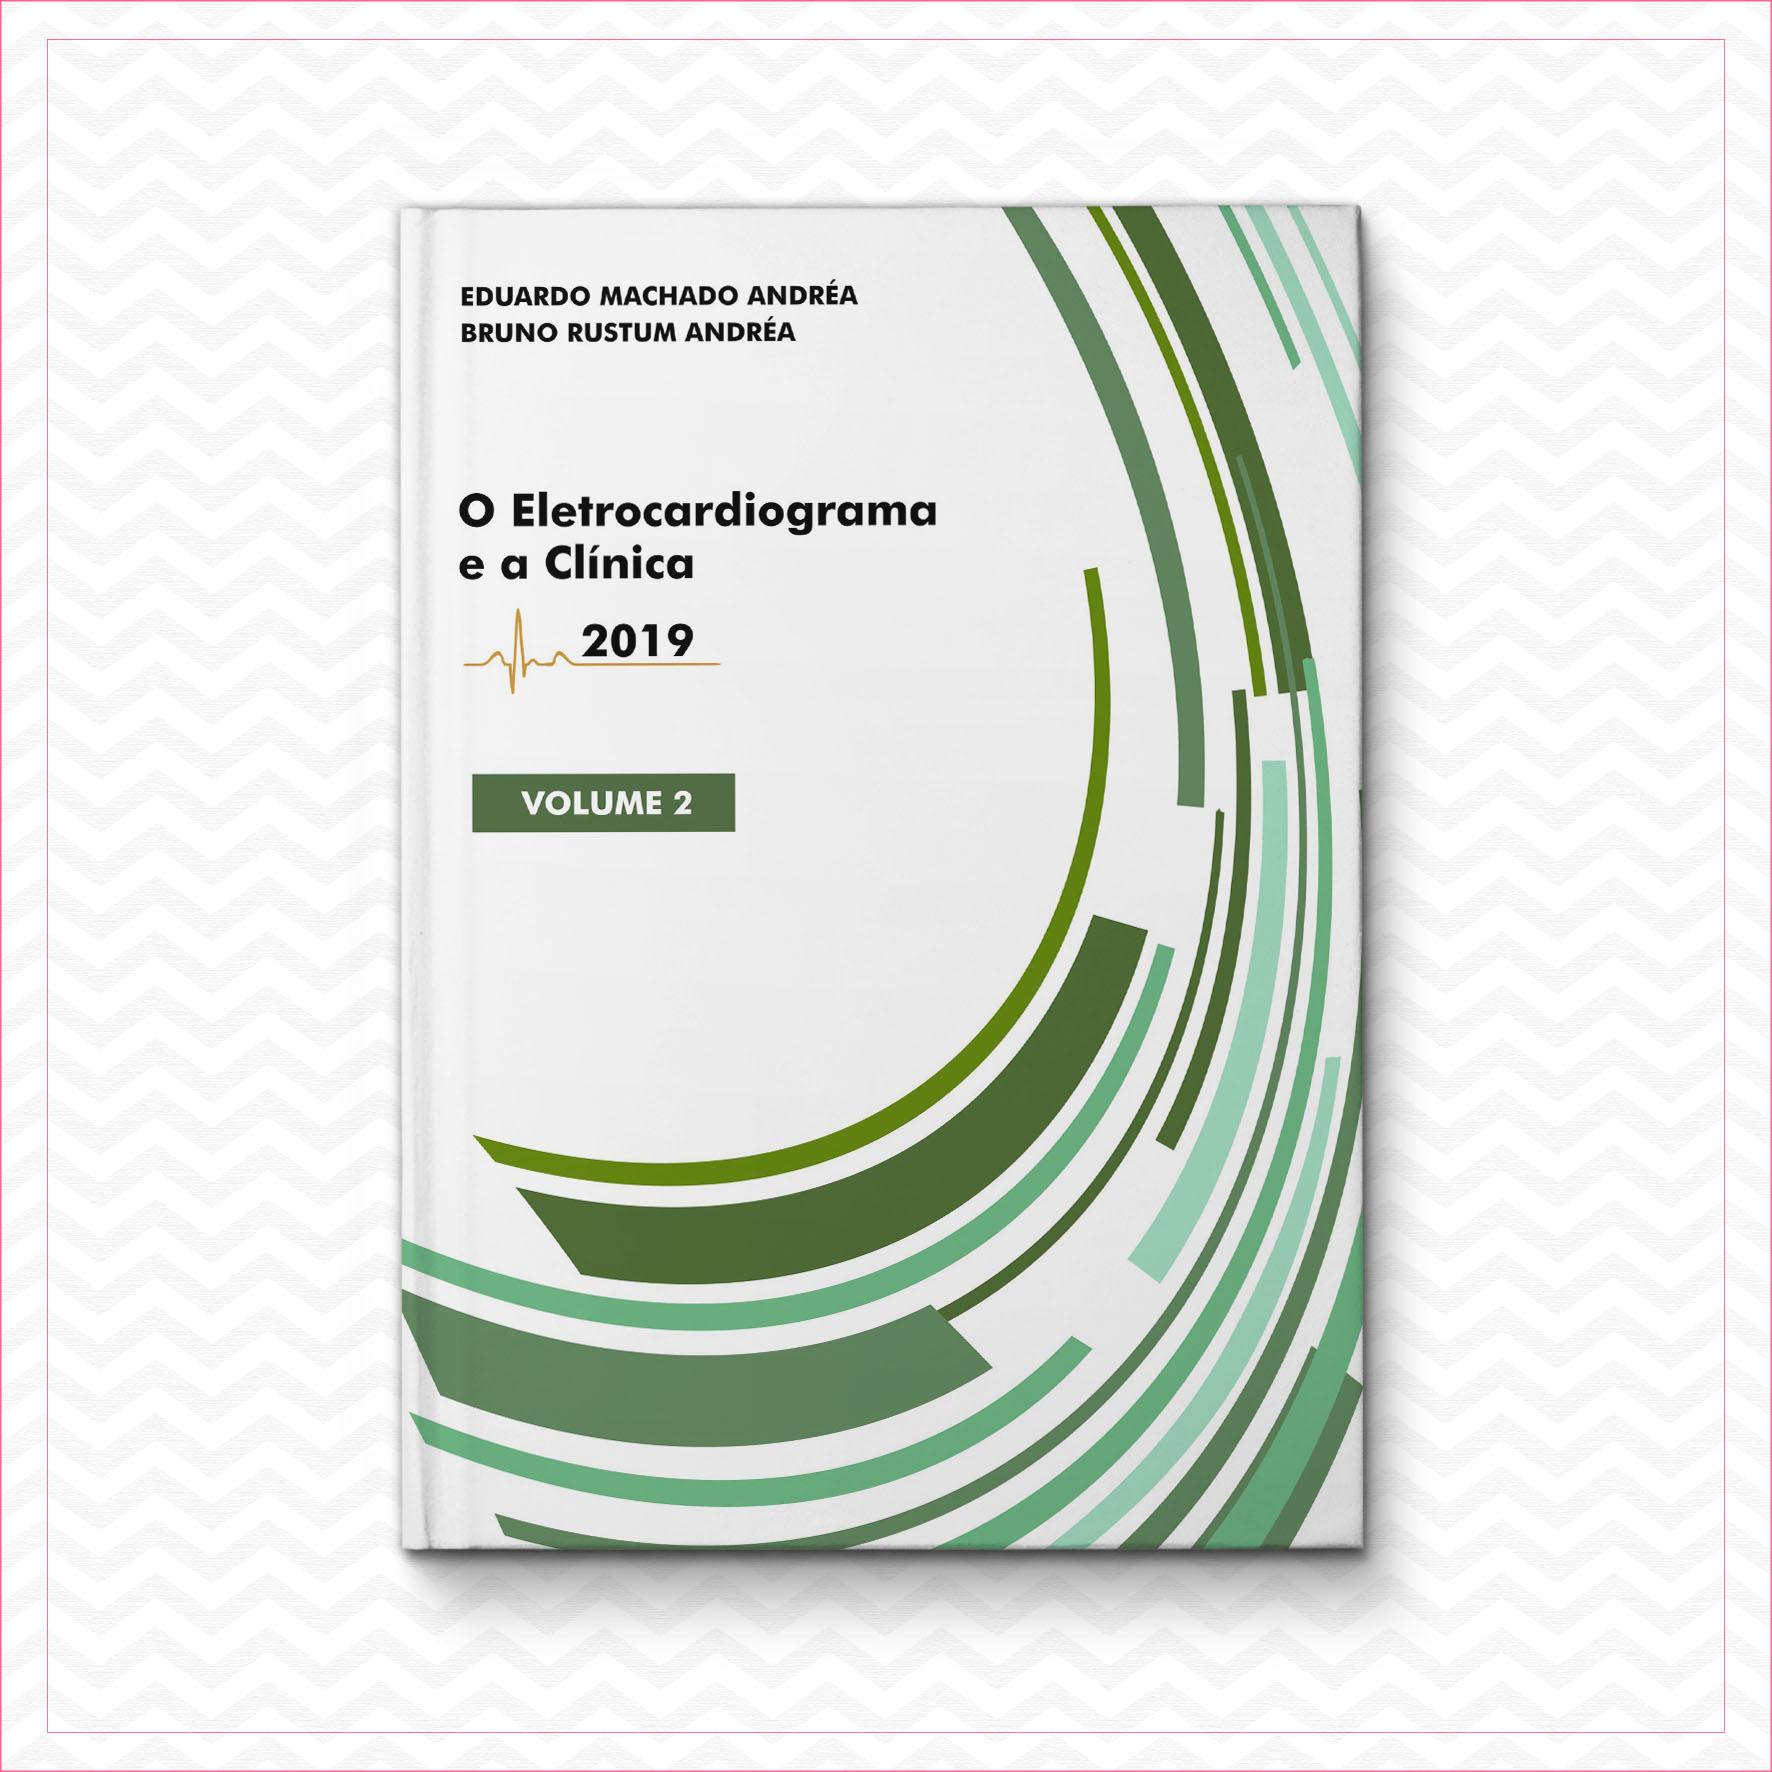 O eletrocardiograma e a clínica 2 – Eduardo Machado Andréa & Bruno Rustum Andréa